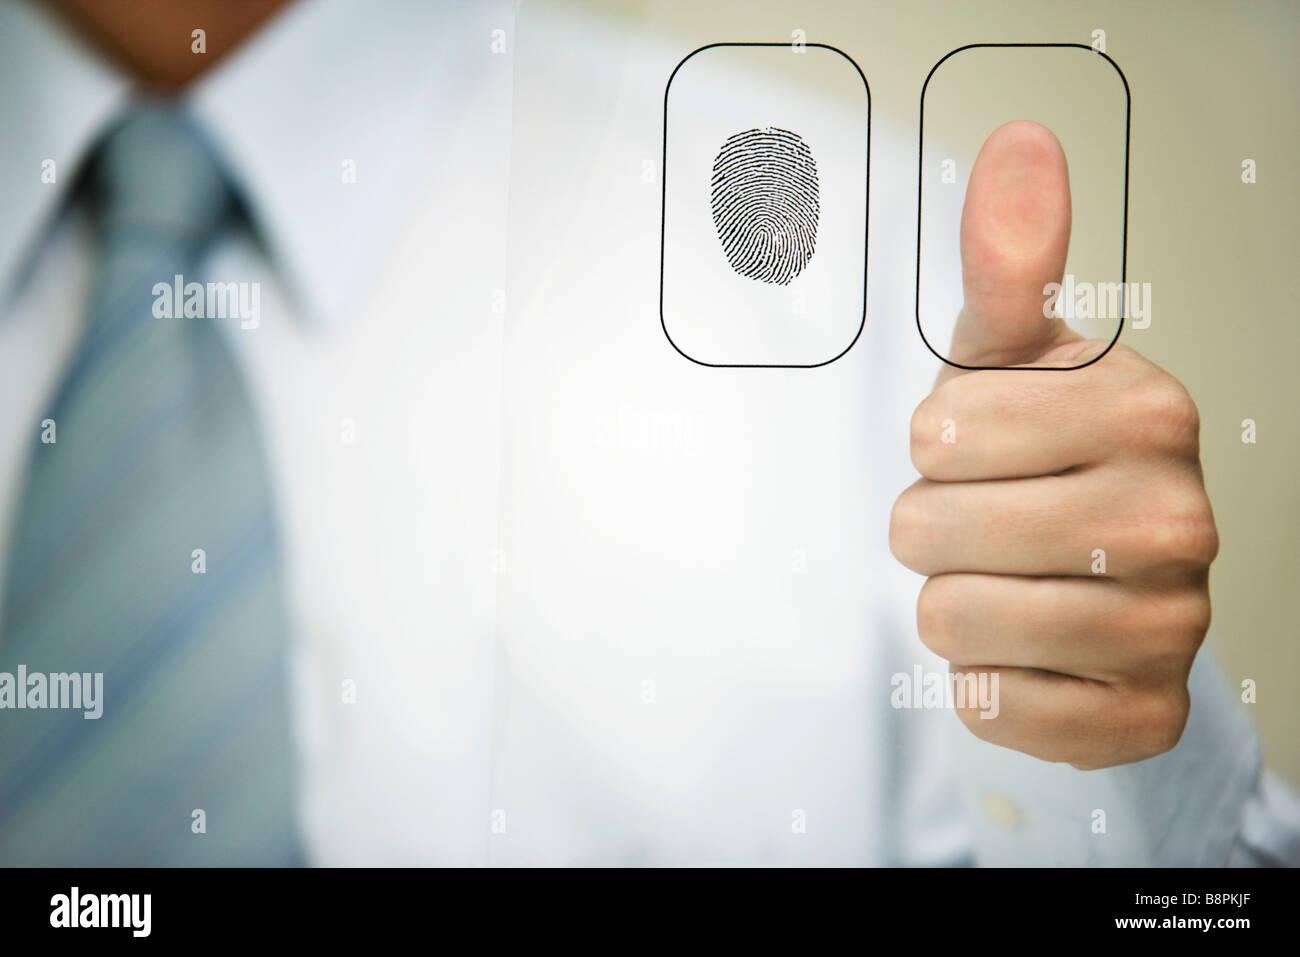 Man pressing thumb to fingerprint reader - Stock Image